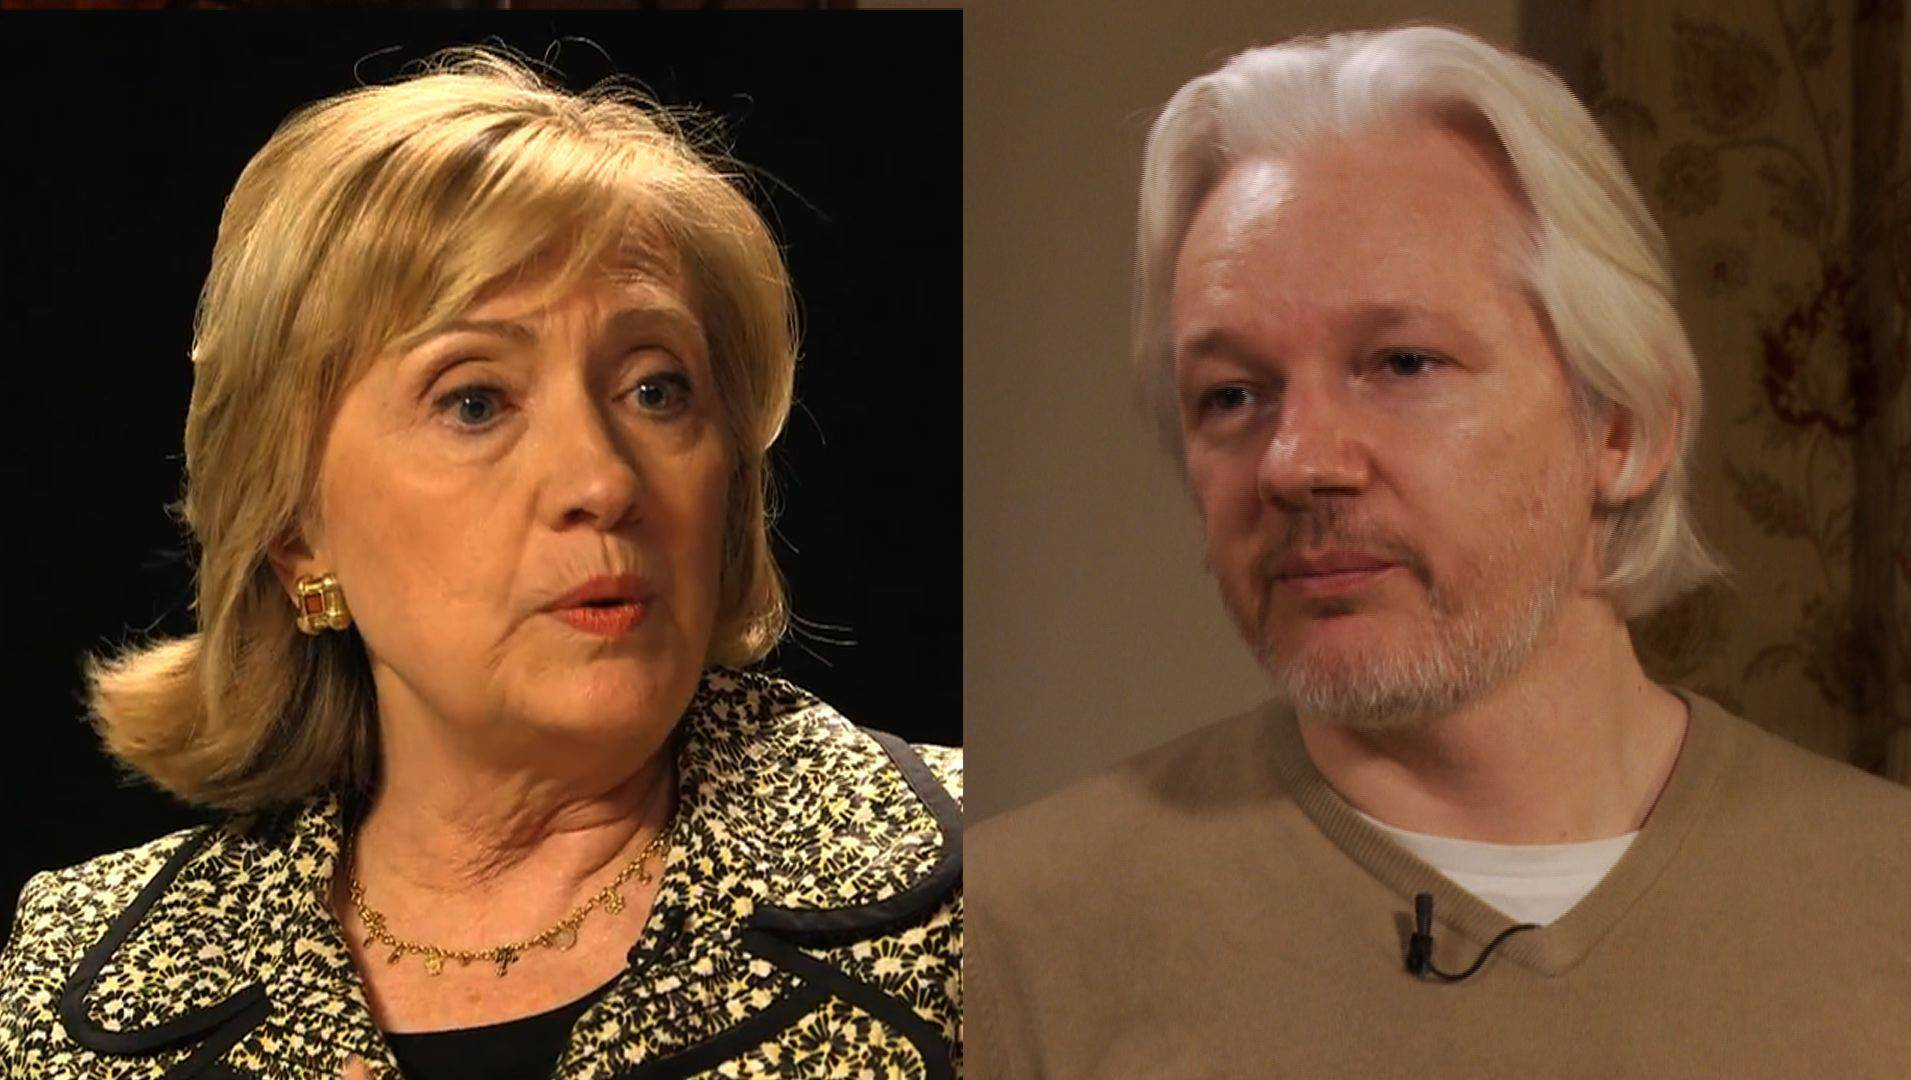 watch full interview julian assange trump emails russia vault more